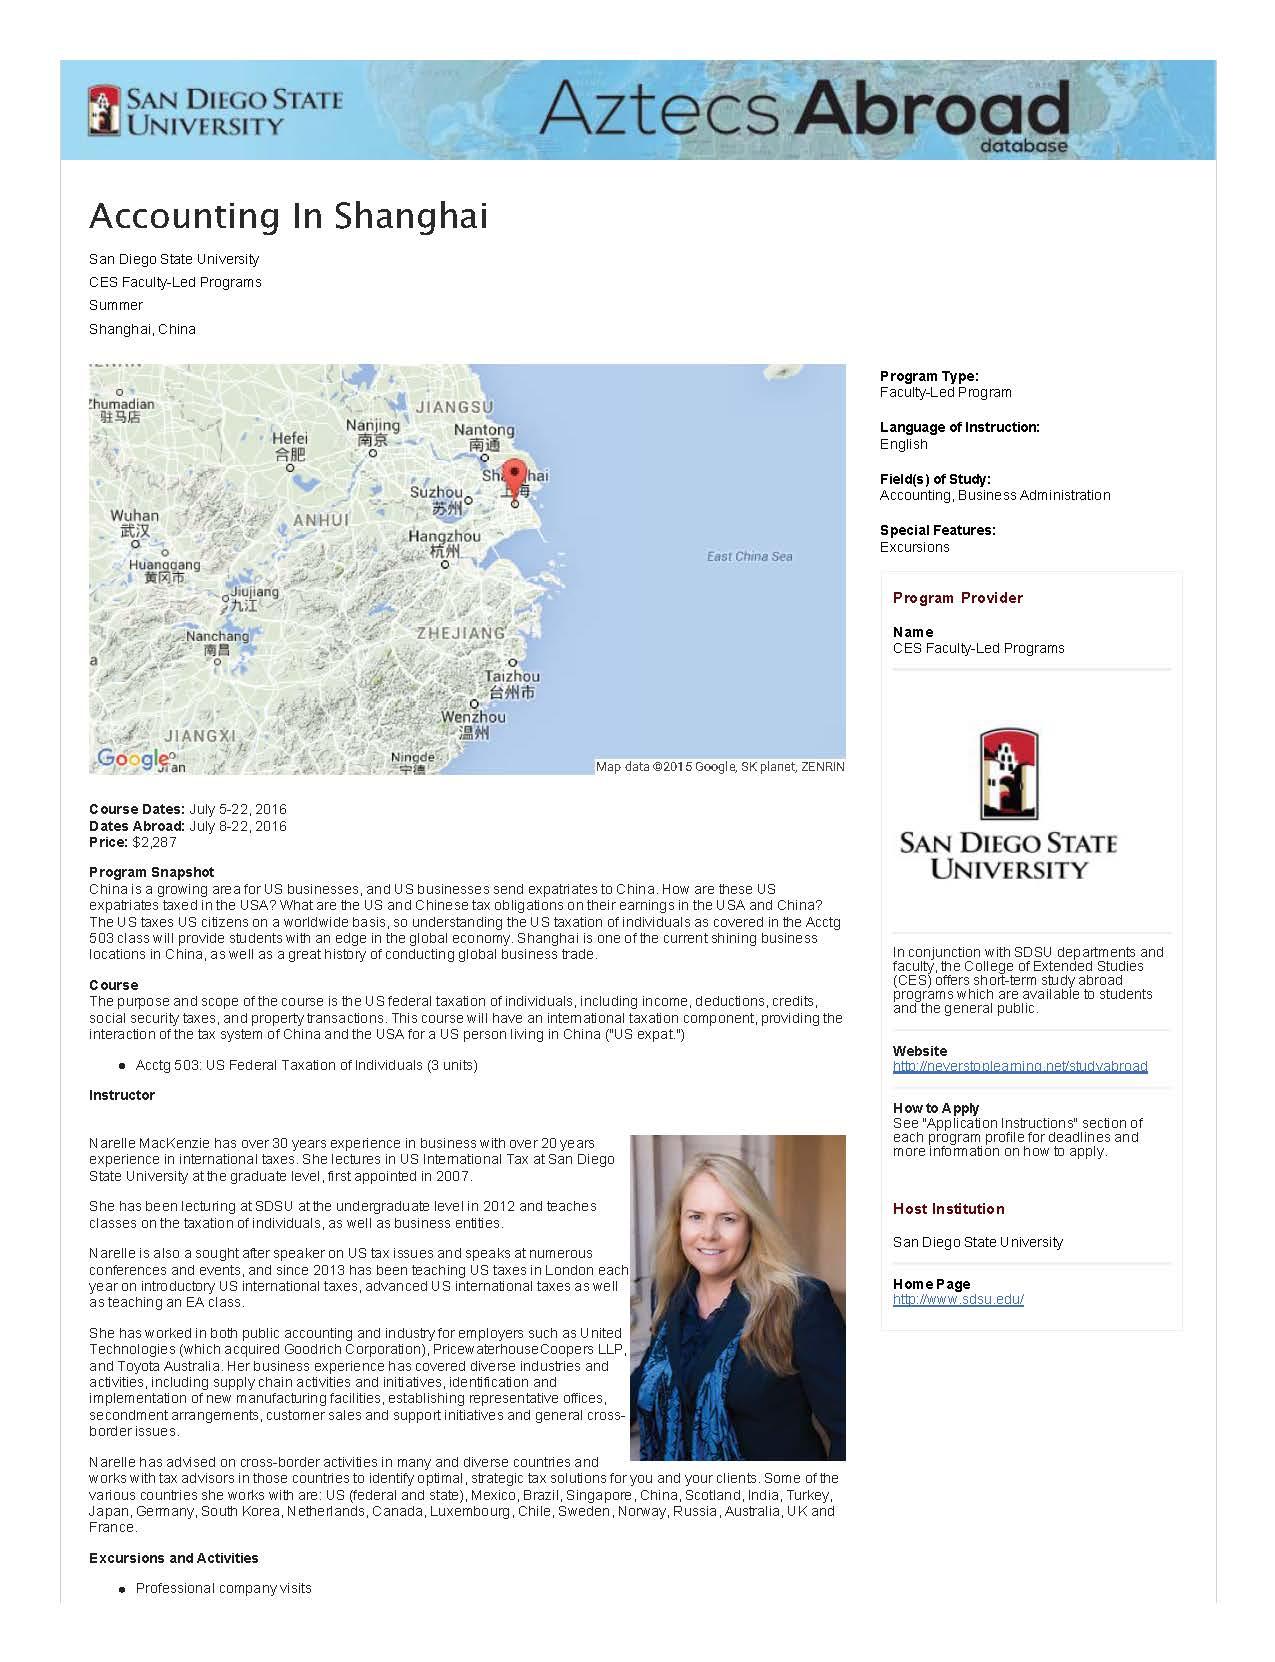 SDSU Aztecs Abroad: Accounting in Shanghai – Summer 2016